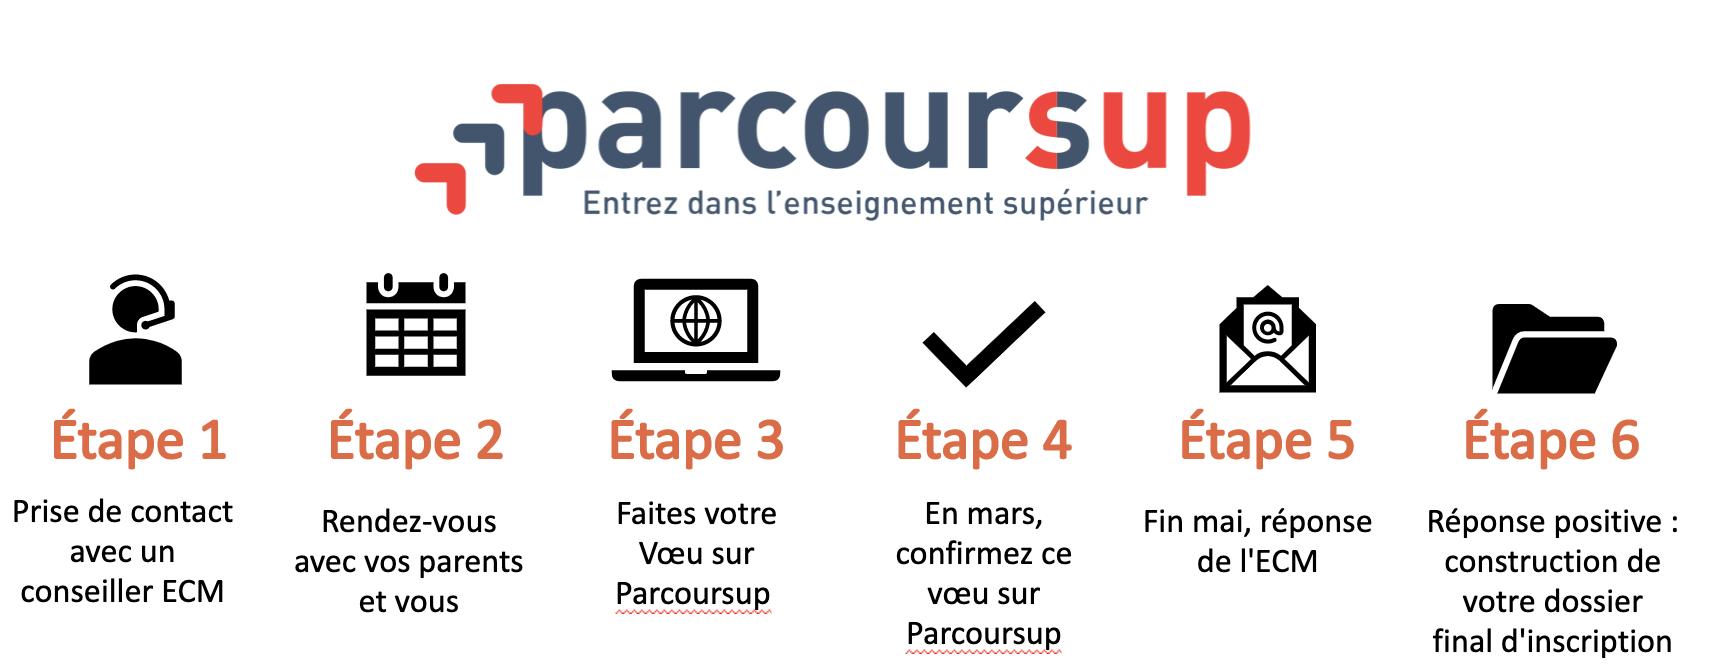 Parcoursup Licence BTS alternance Besançon Belfort Dijon